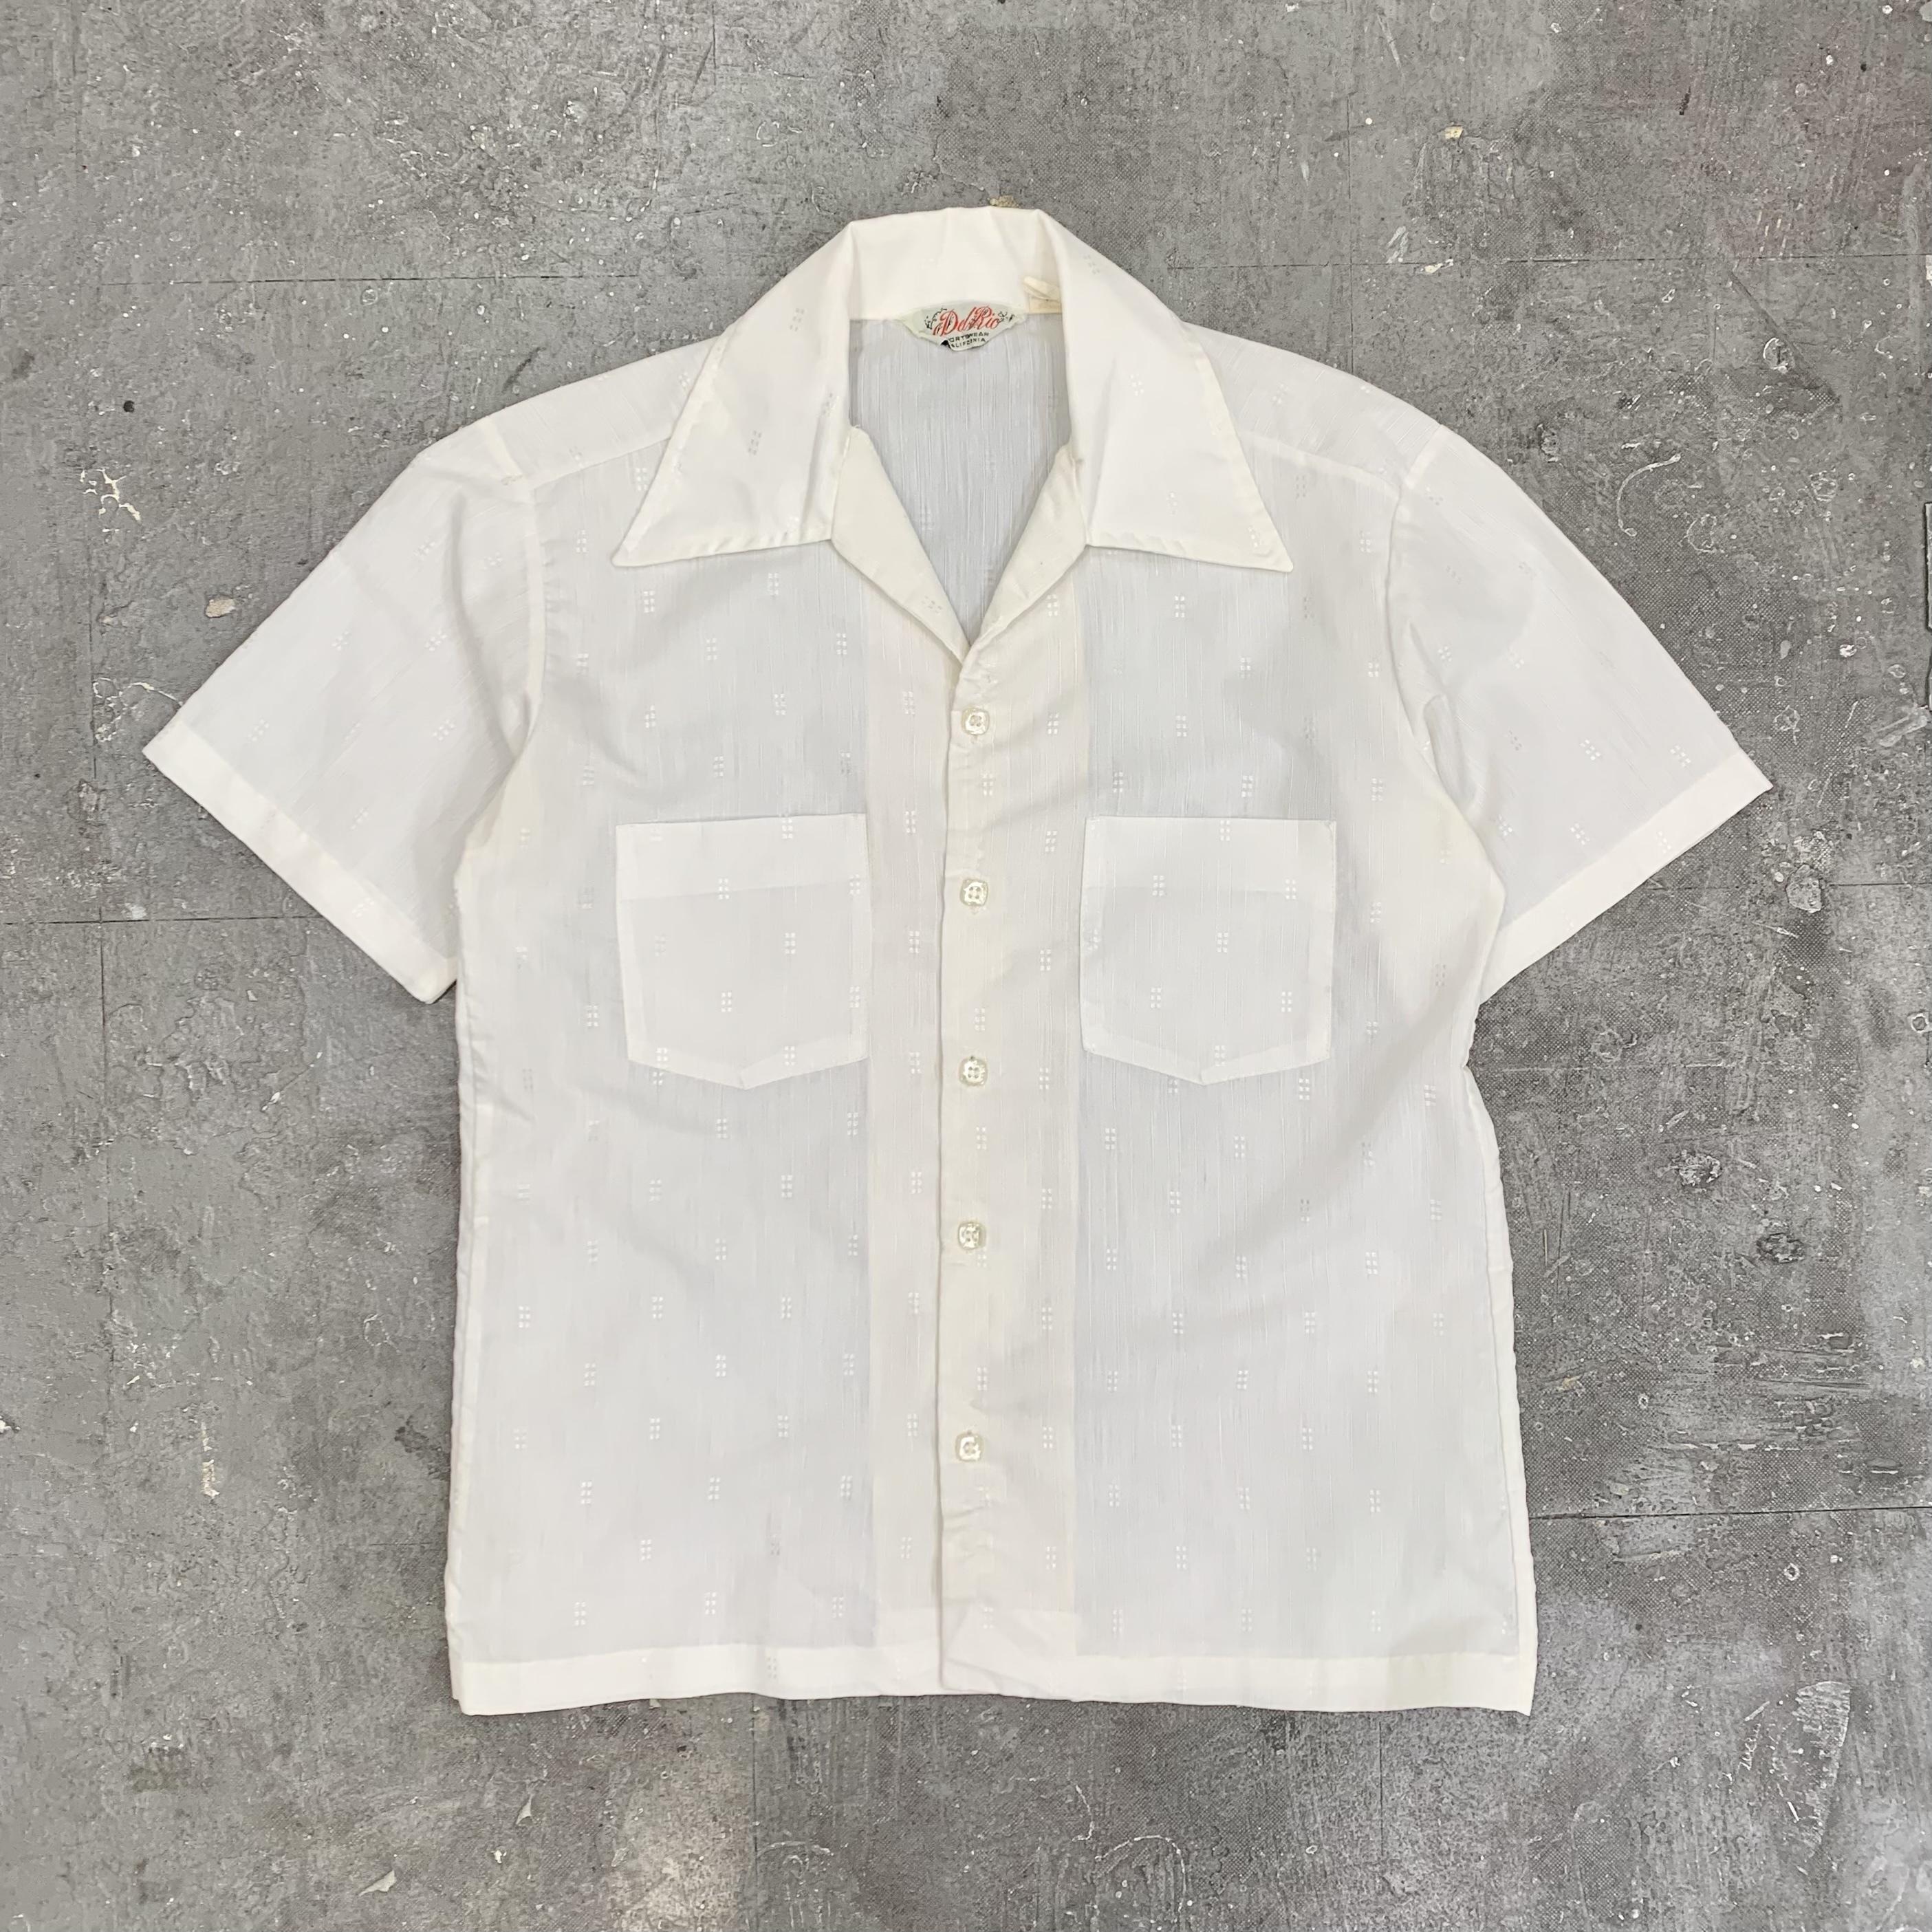 70's Euro Shirt / Size M